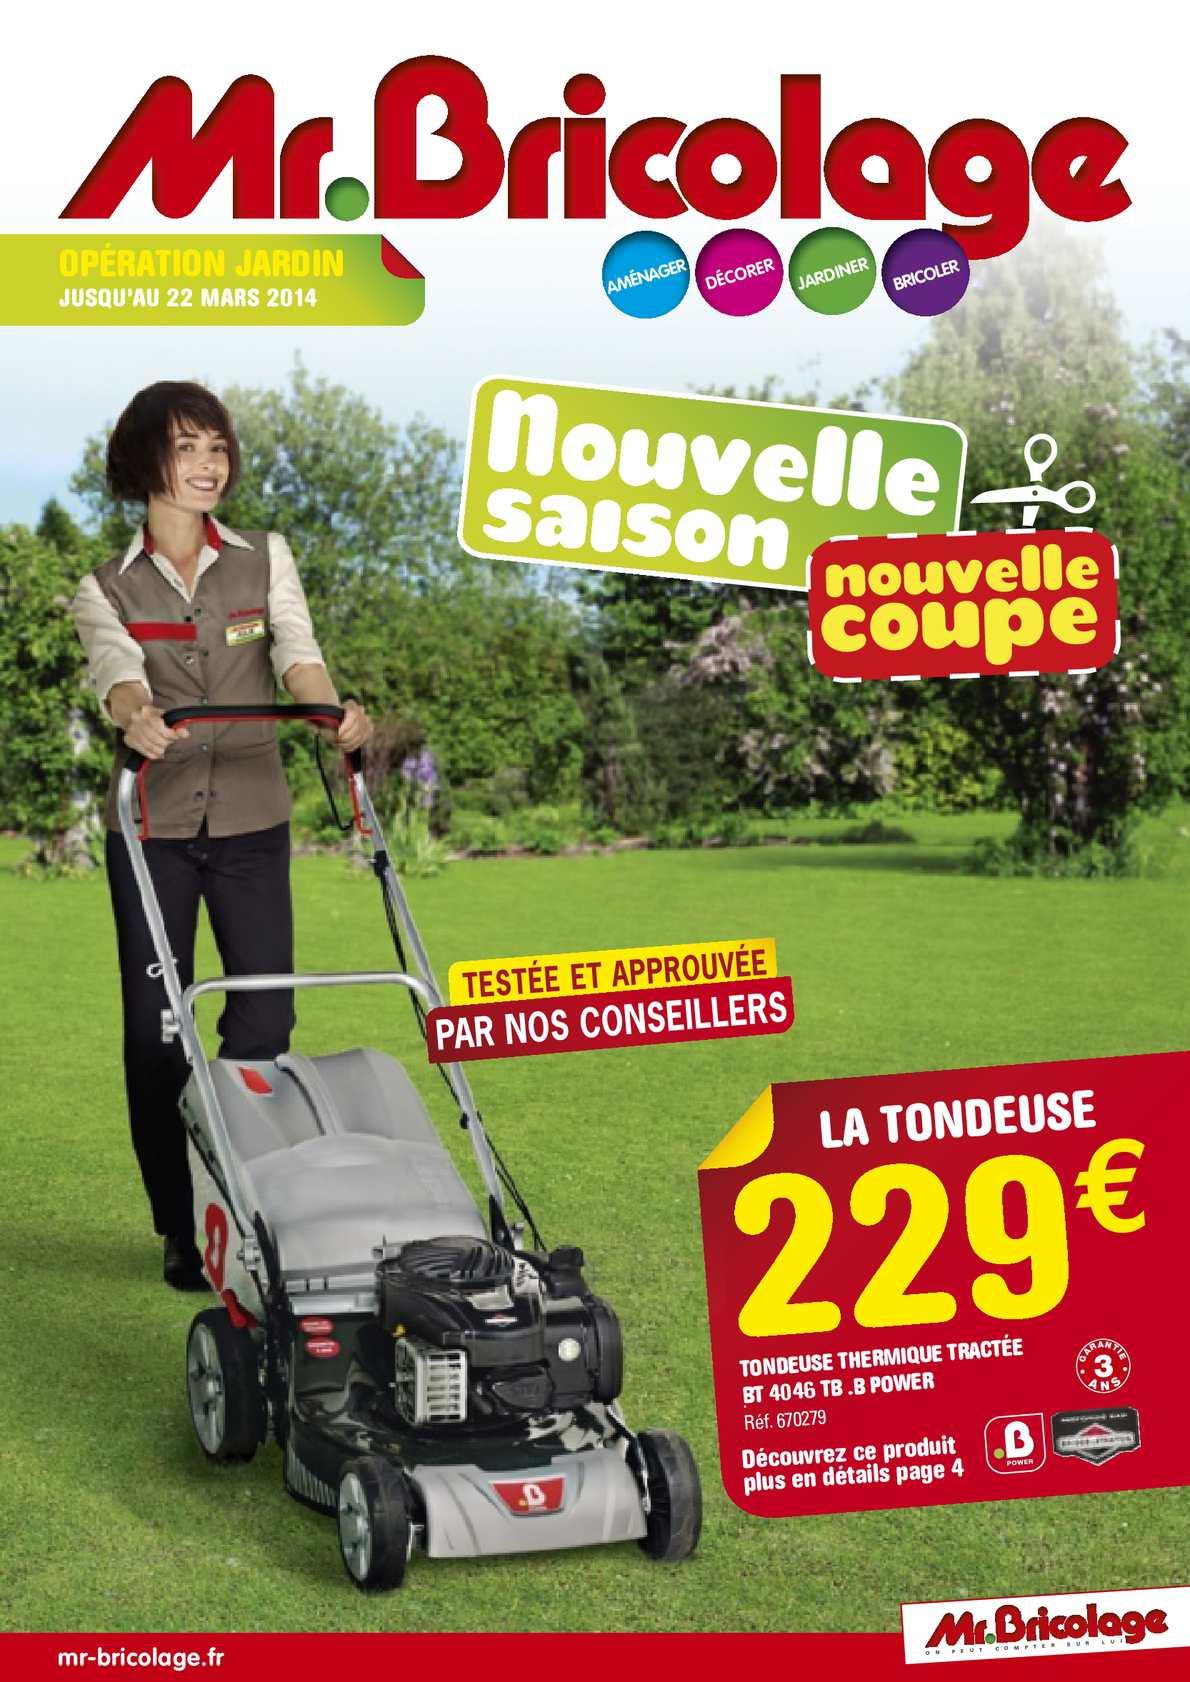 2bb257599c2 Calaméo - Mr.Bricolage - Catalogue Jardin 2014 - 8 pages